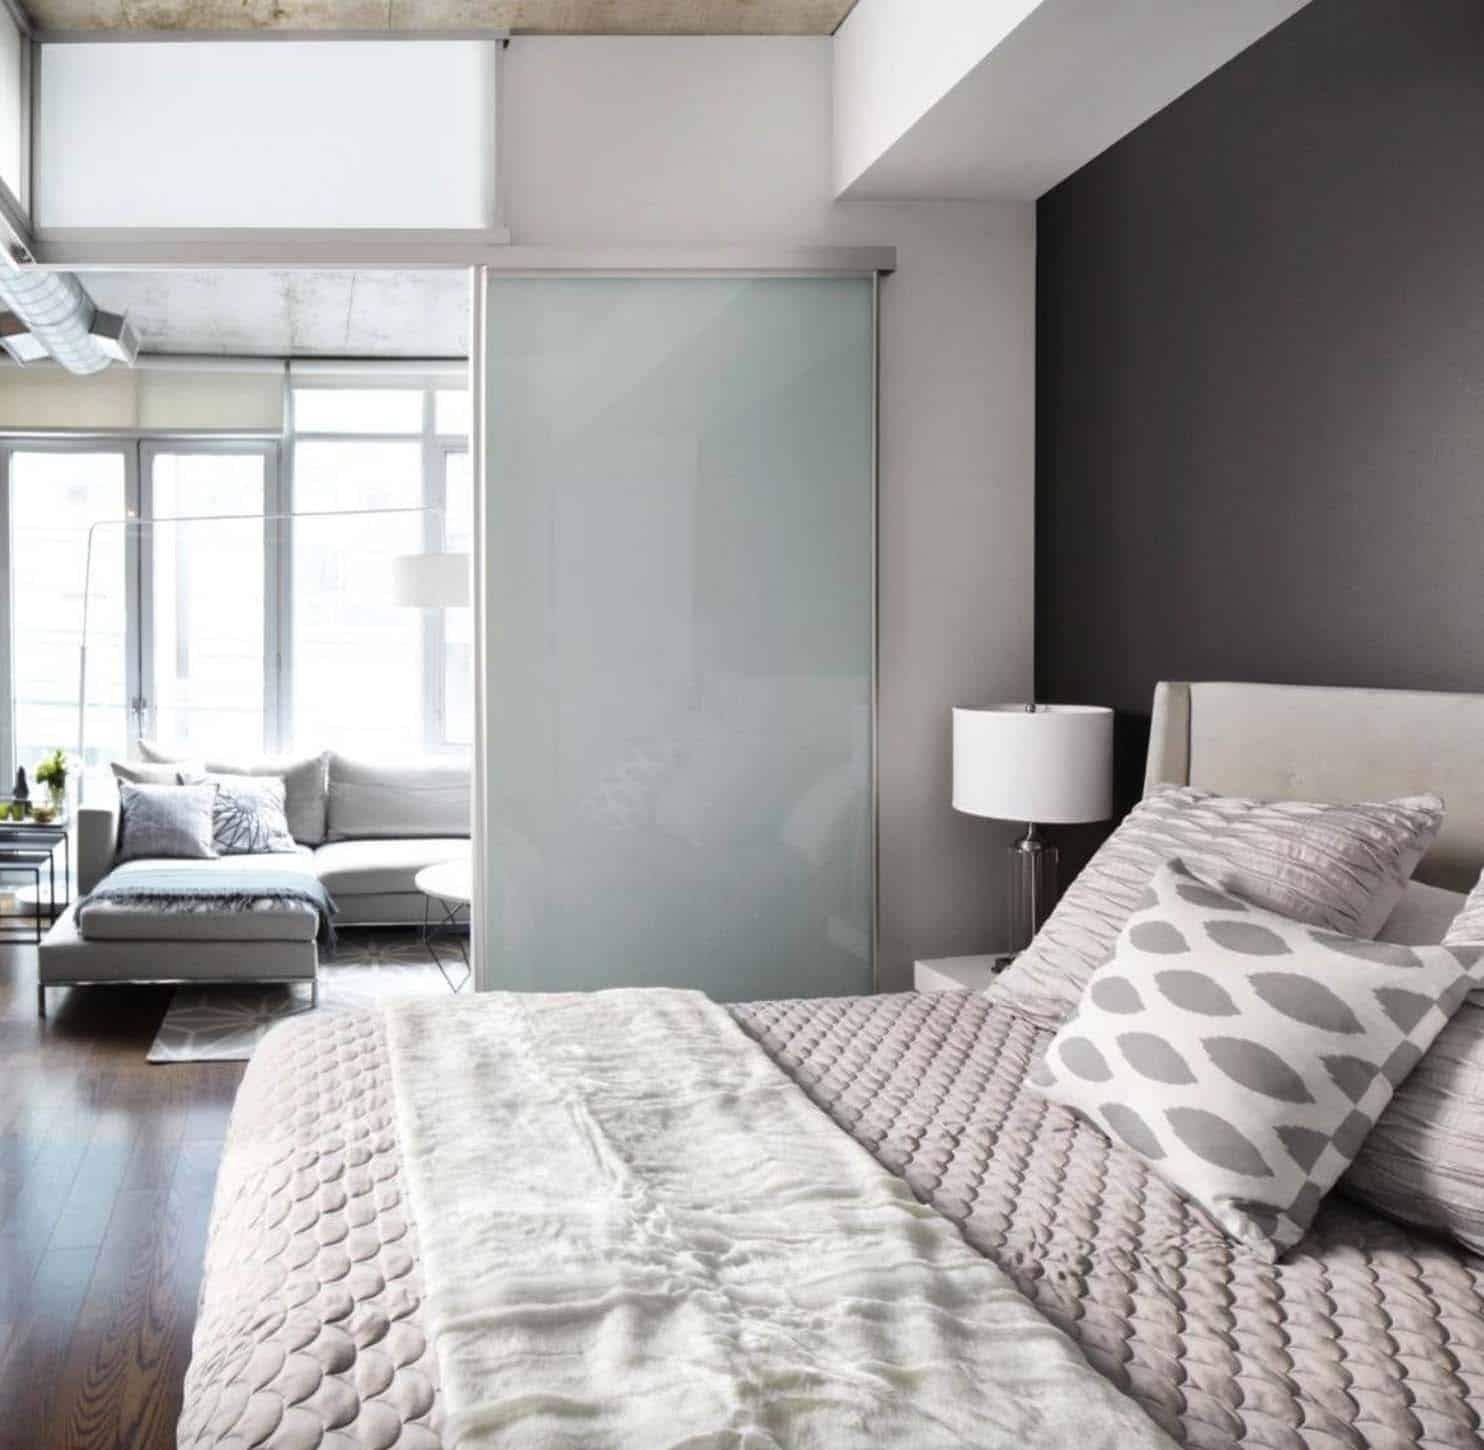 Contemporary Condo Suite-LUX Design-05-1 Kindesign